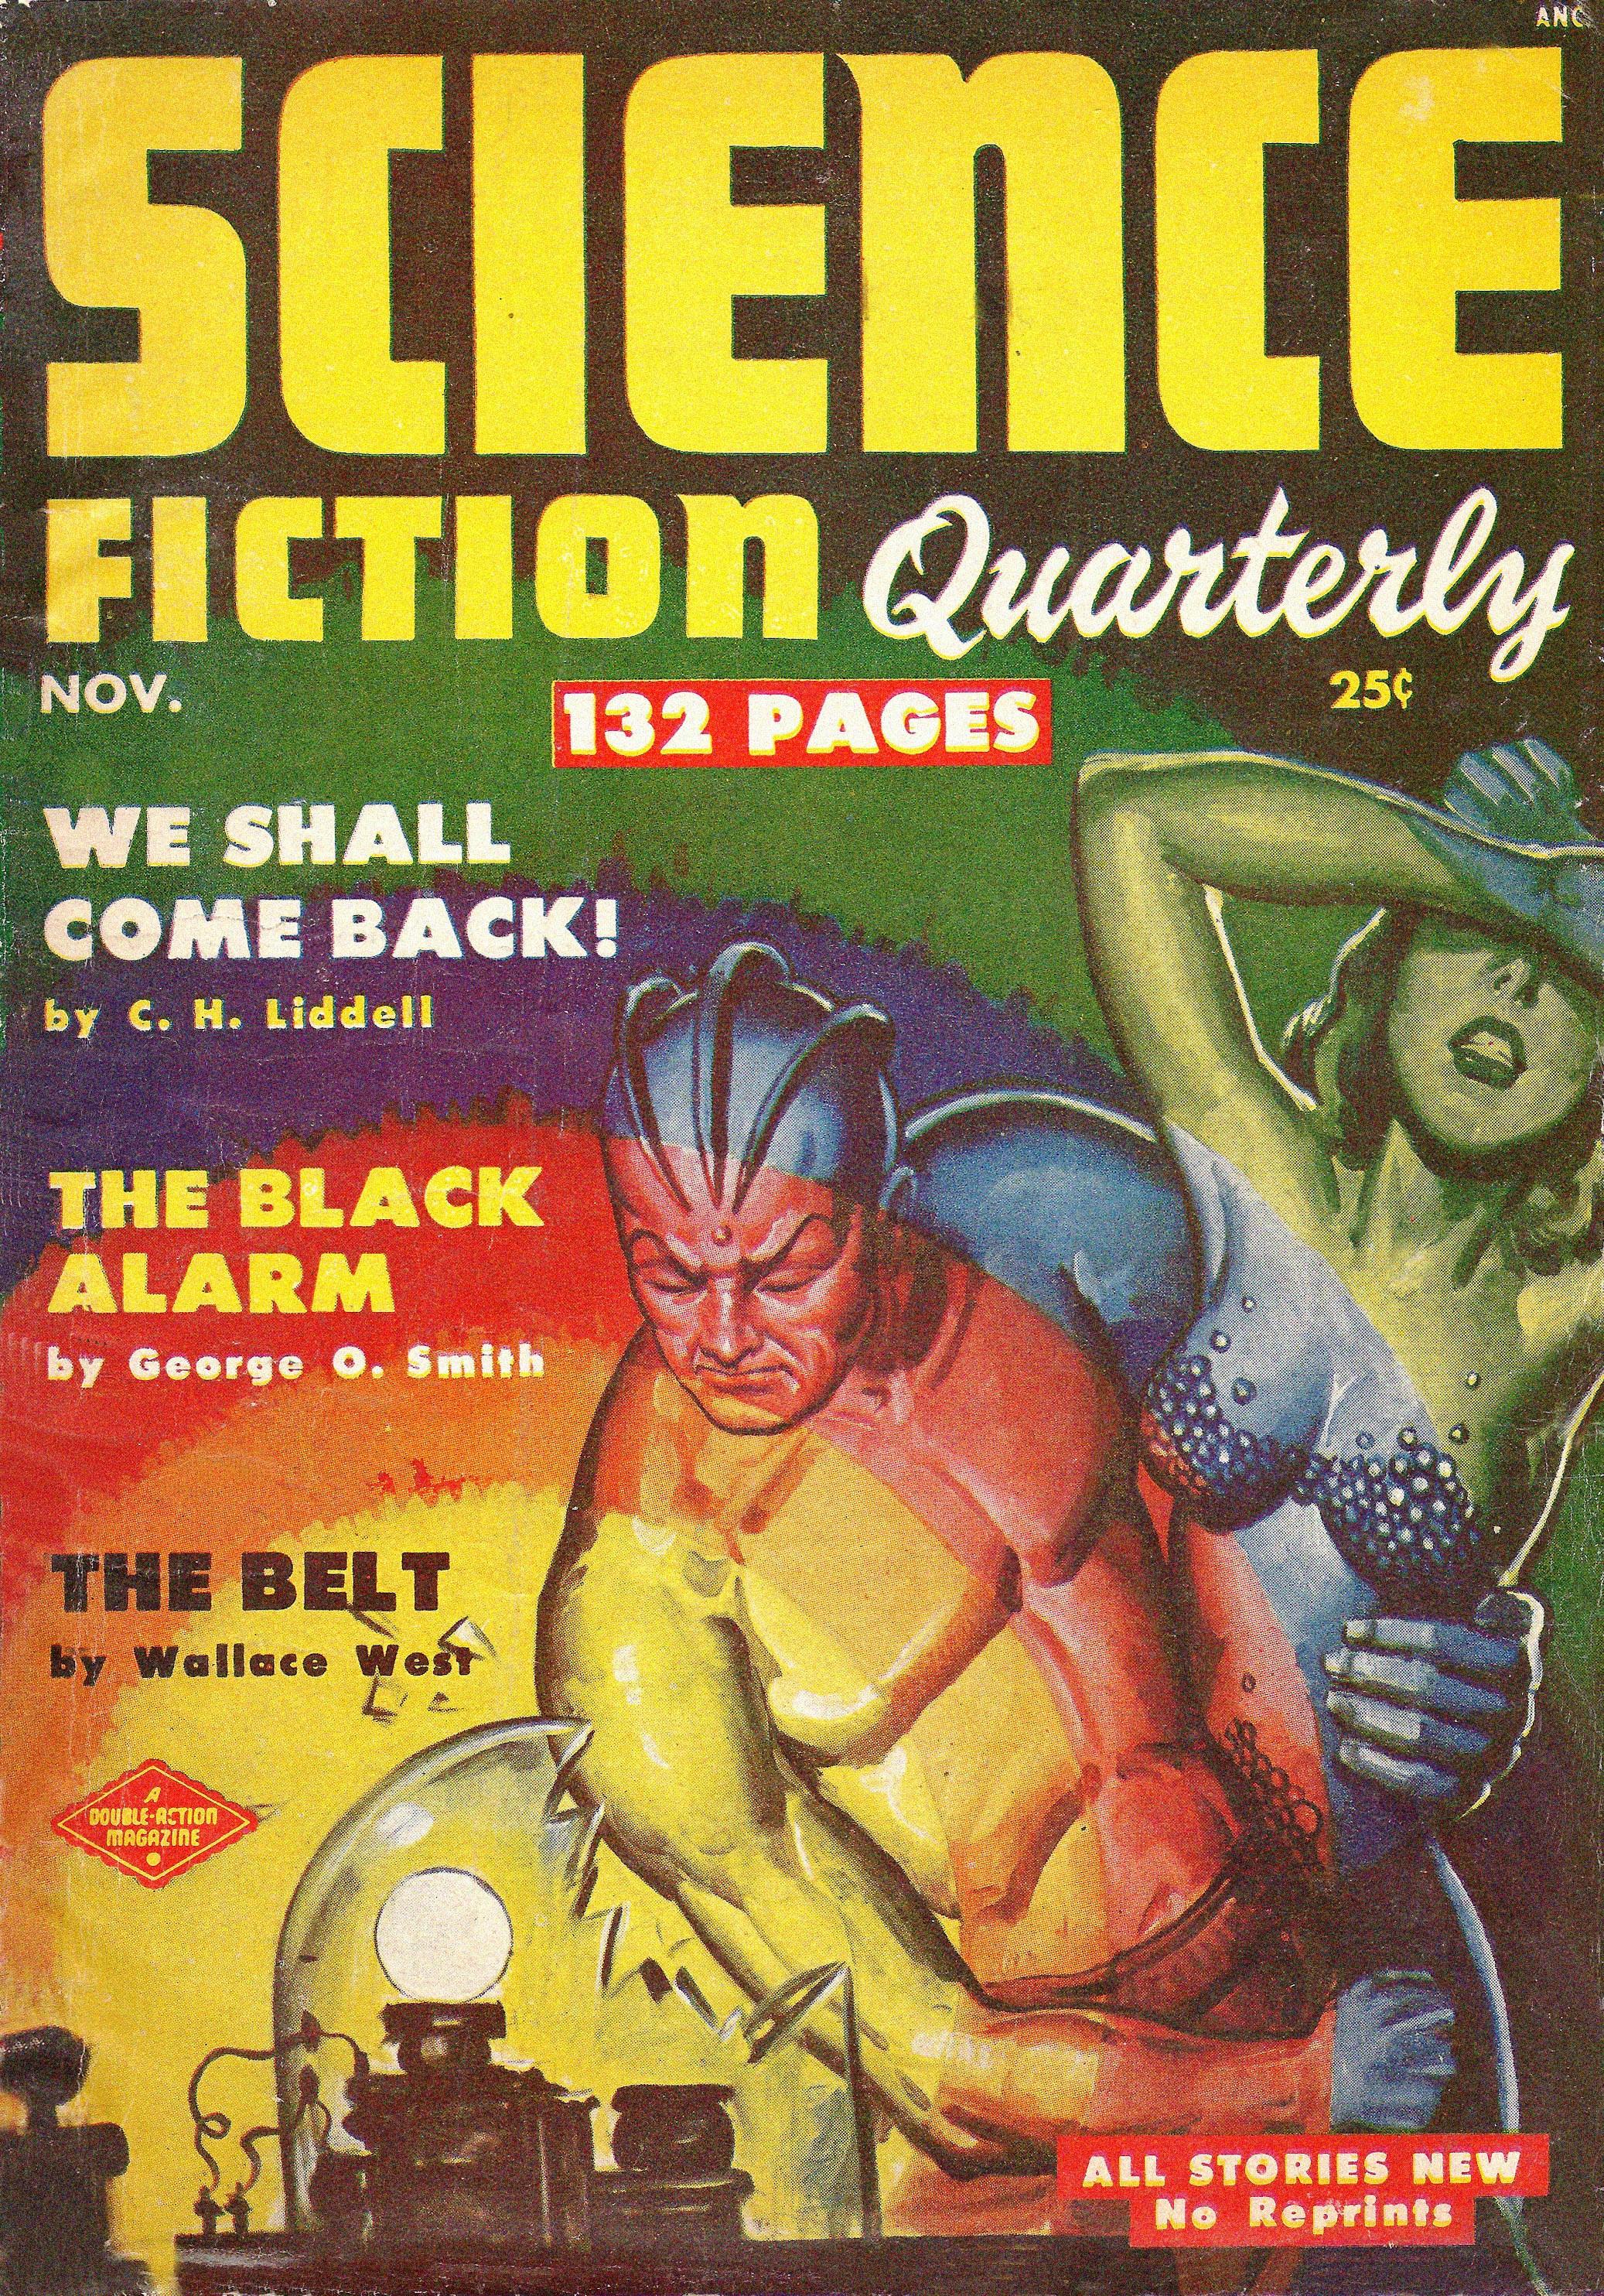 Science Fiction Quarterly, November 1951